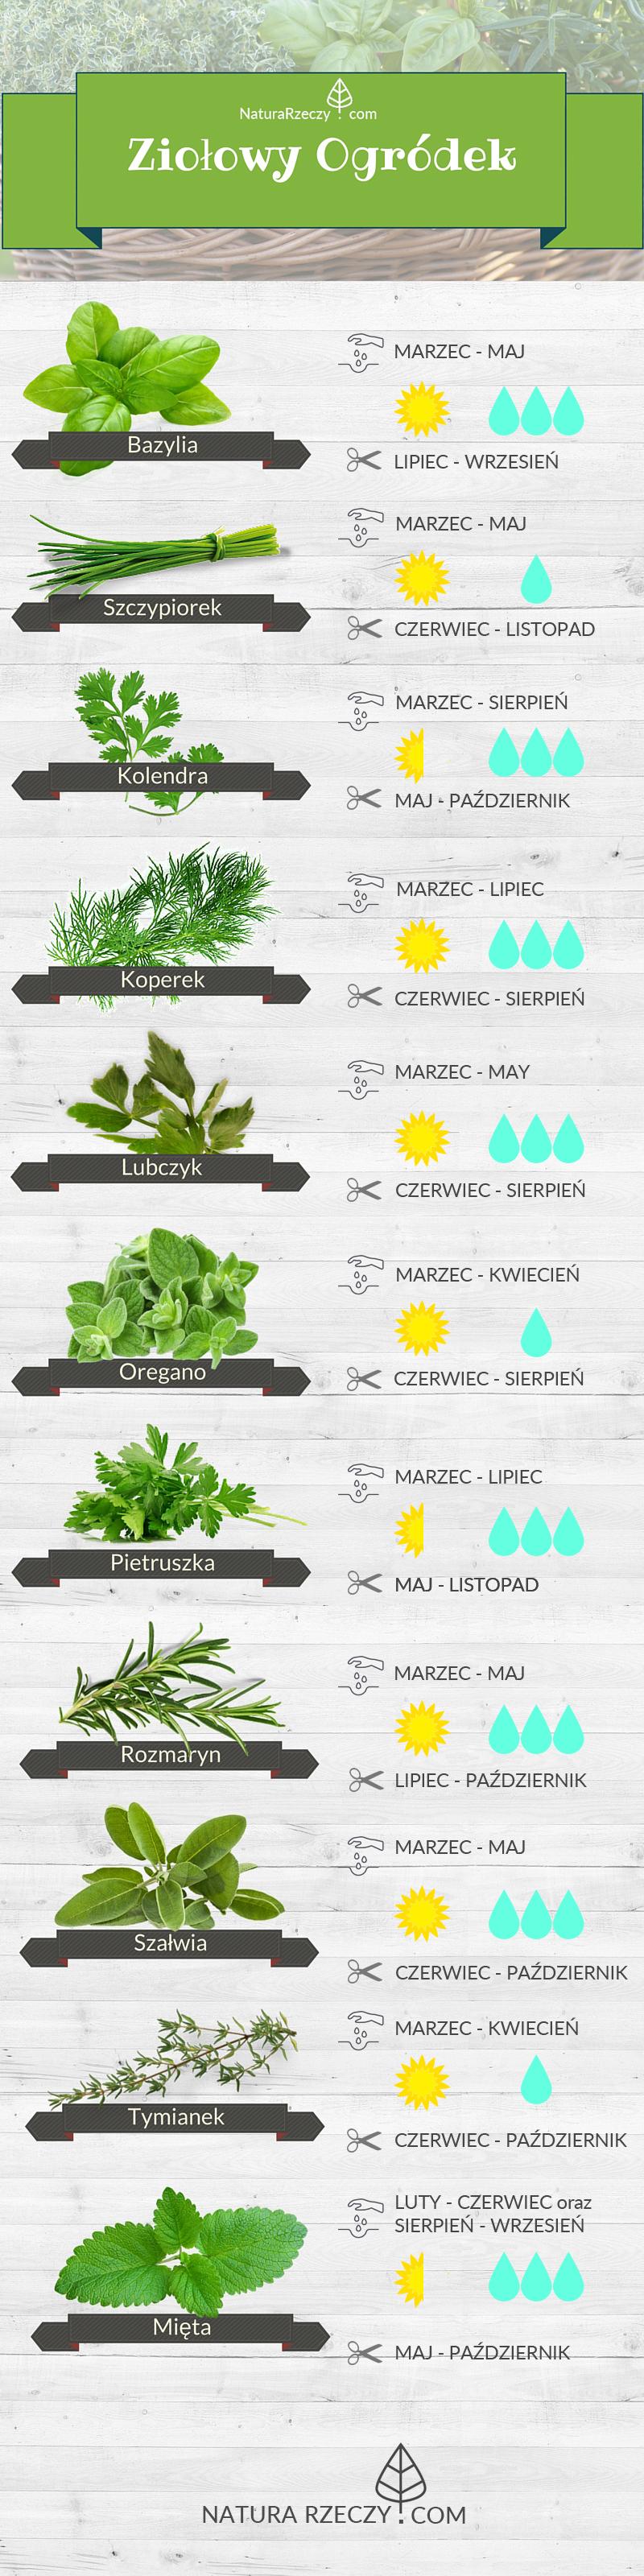 Ikonografika Ziolowy Ogrodek Growing Vegetables Magical Garden Vegetable Garden